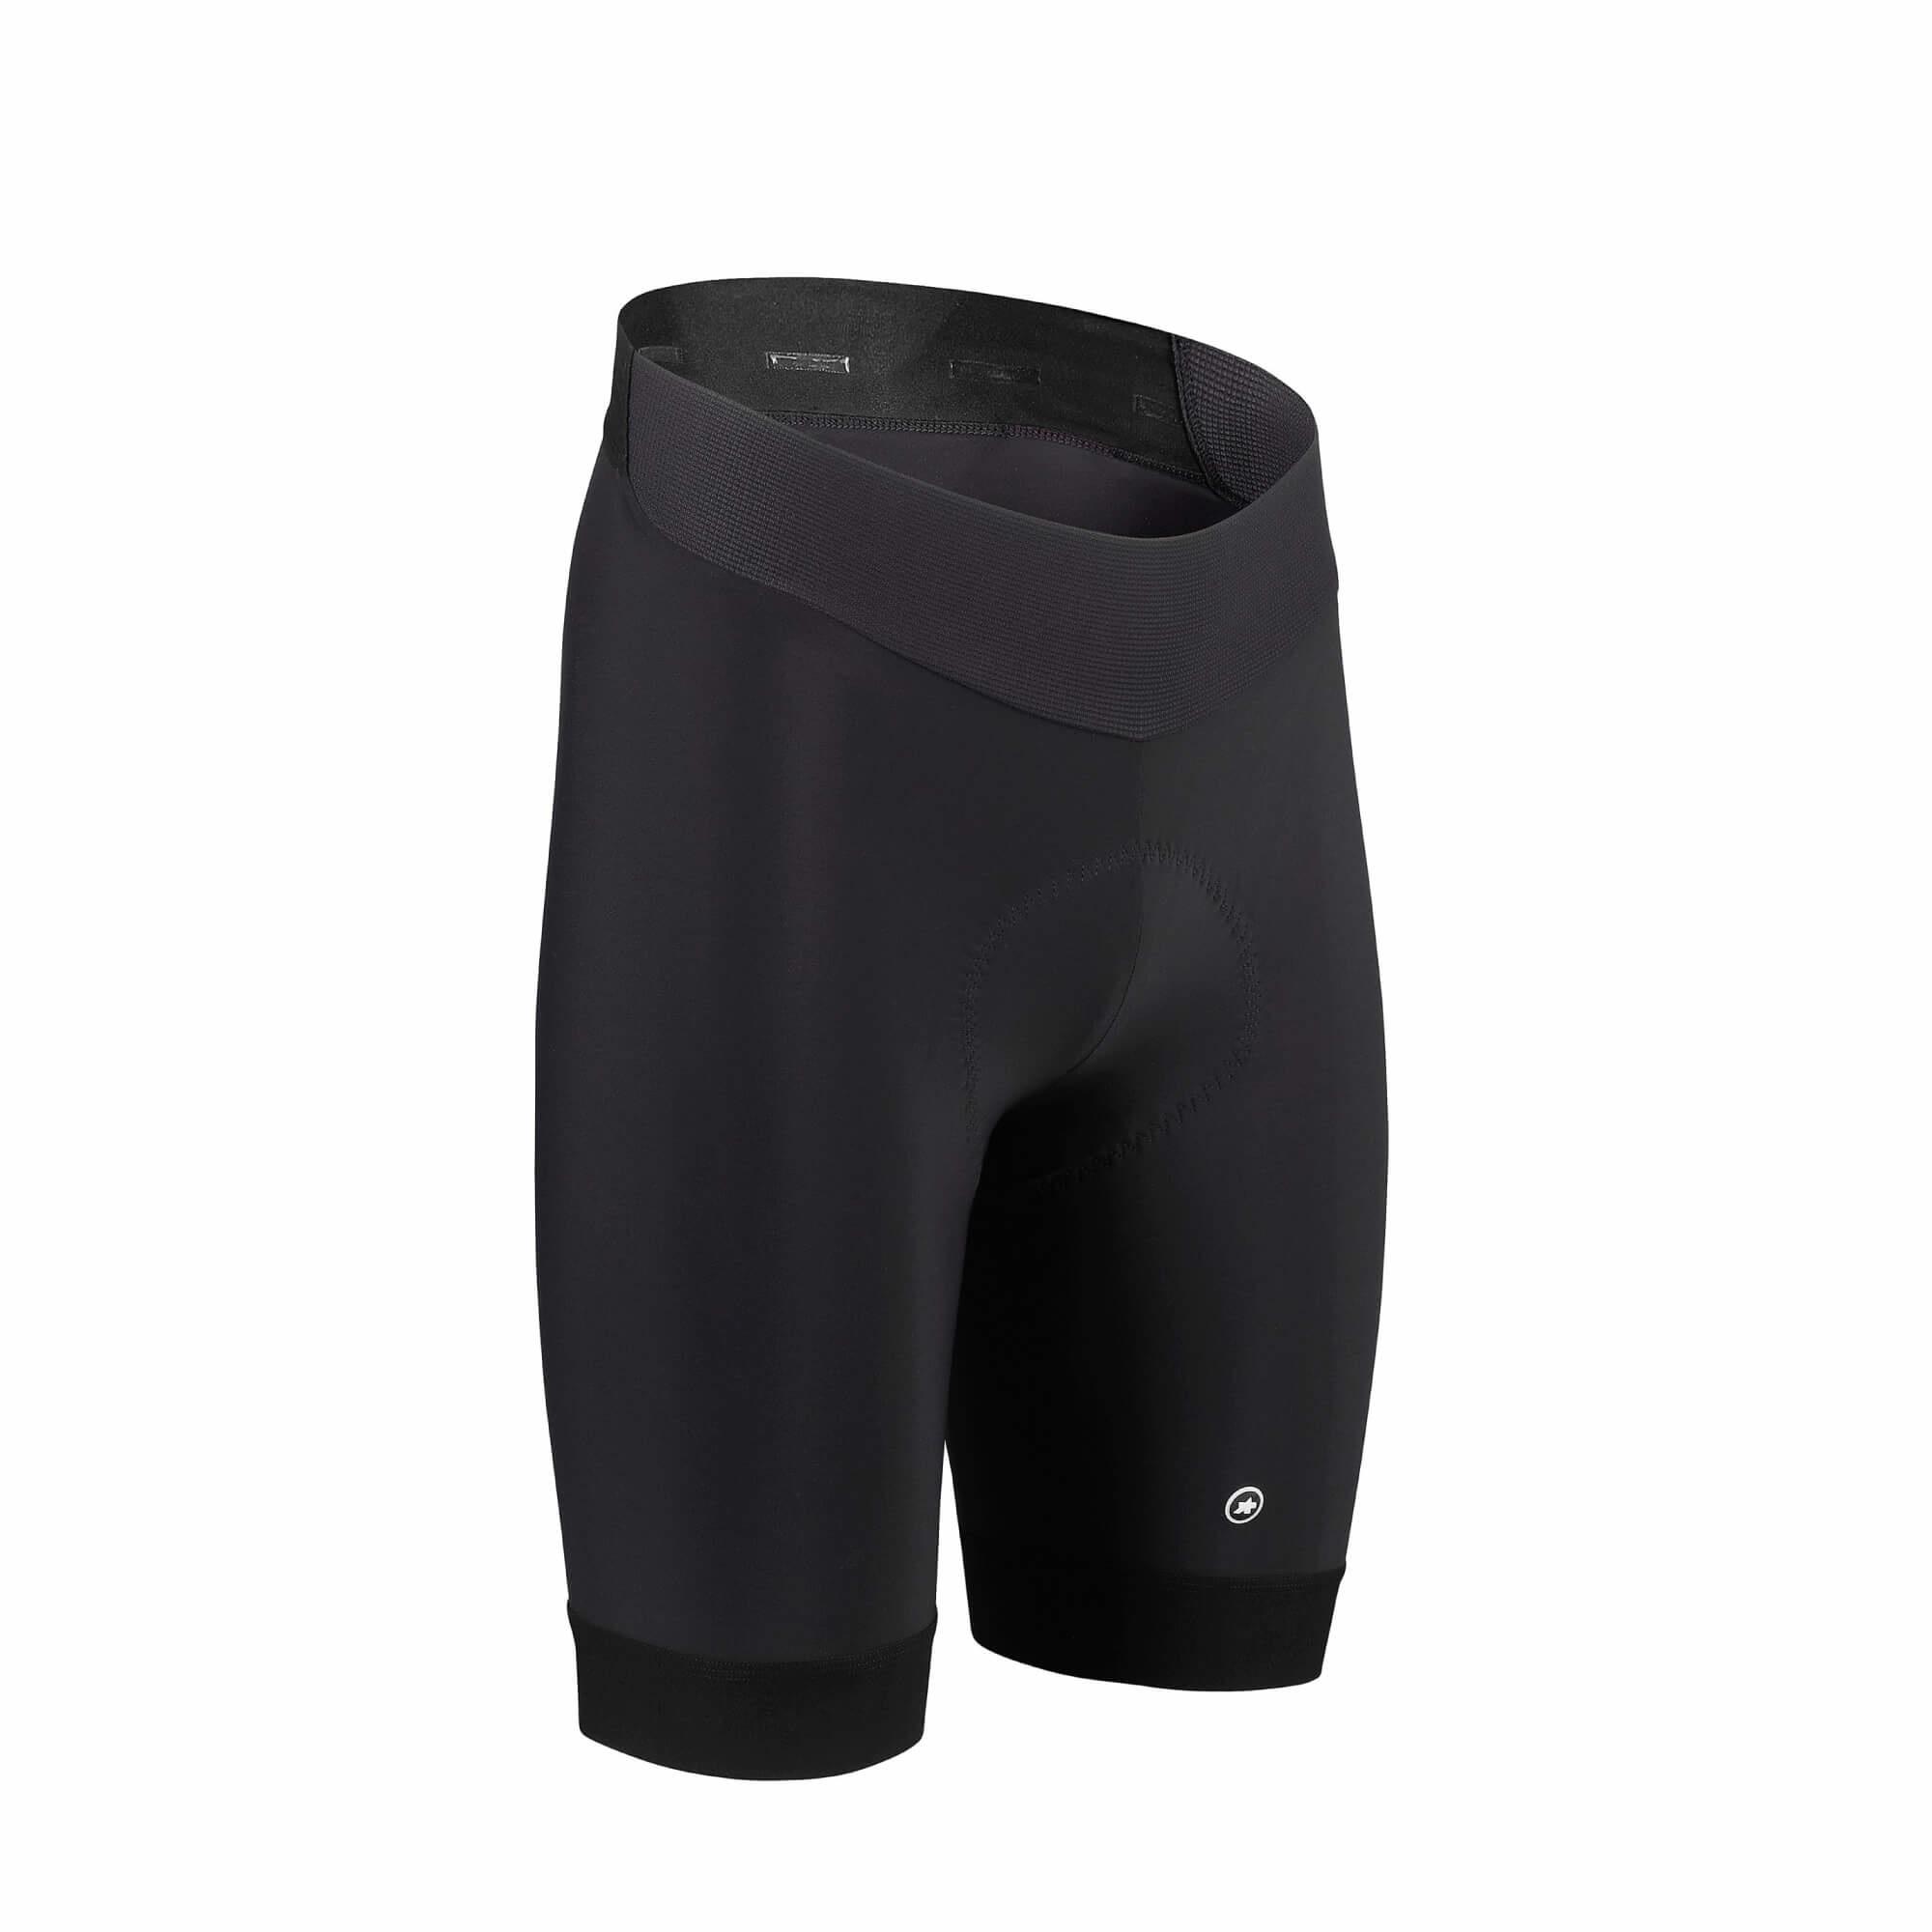 H.Mille S7 Bib Shorts-2